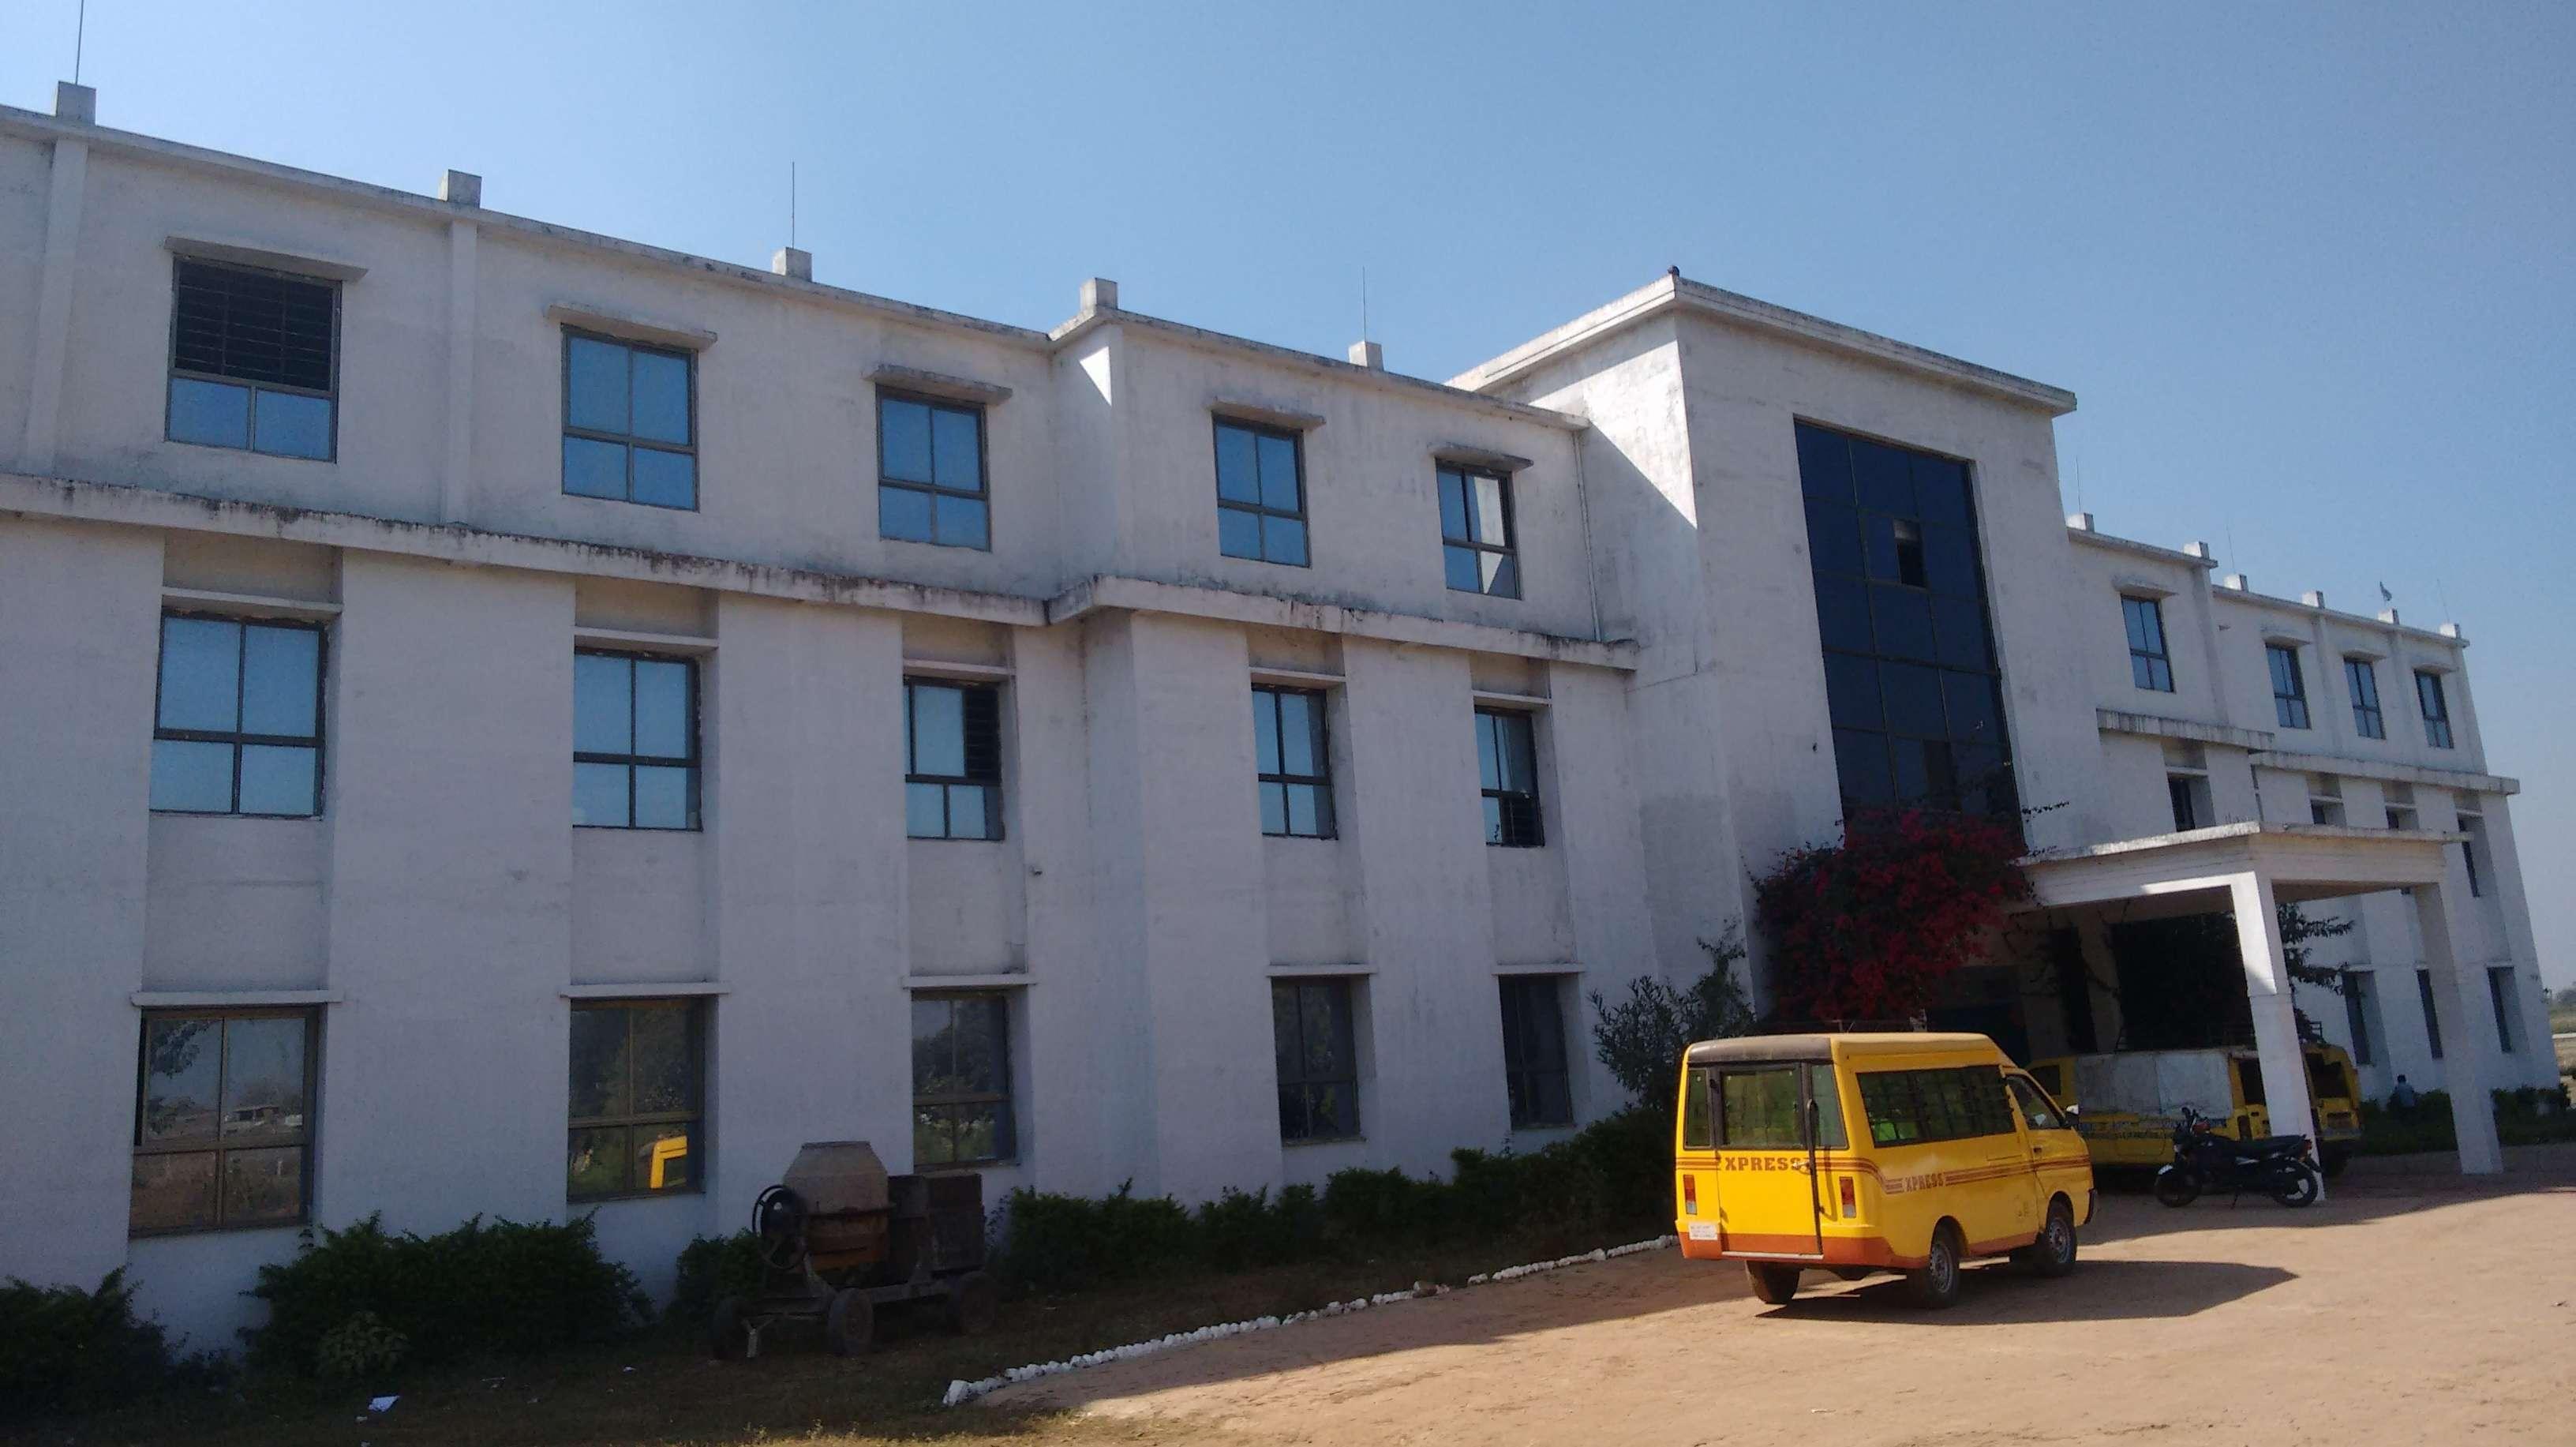 DAKSH INTERNATIONAL SCHOOL NARSIMHAPUR MADHYA PRADESH 1030781